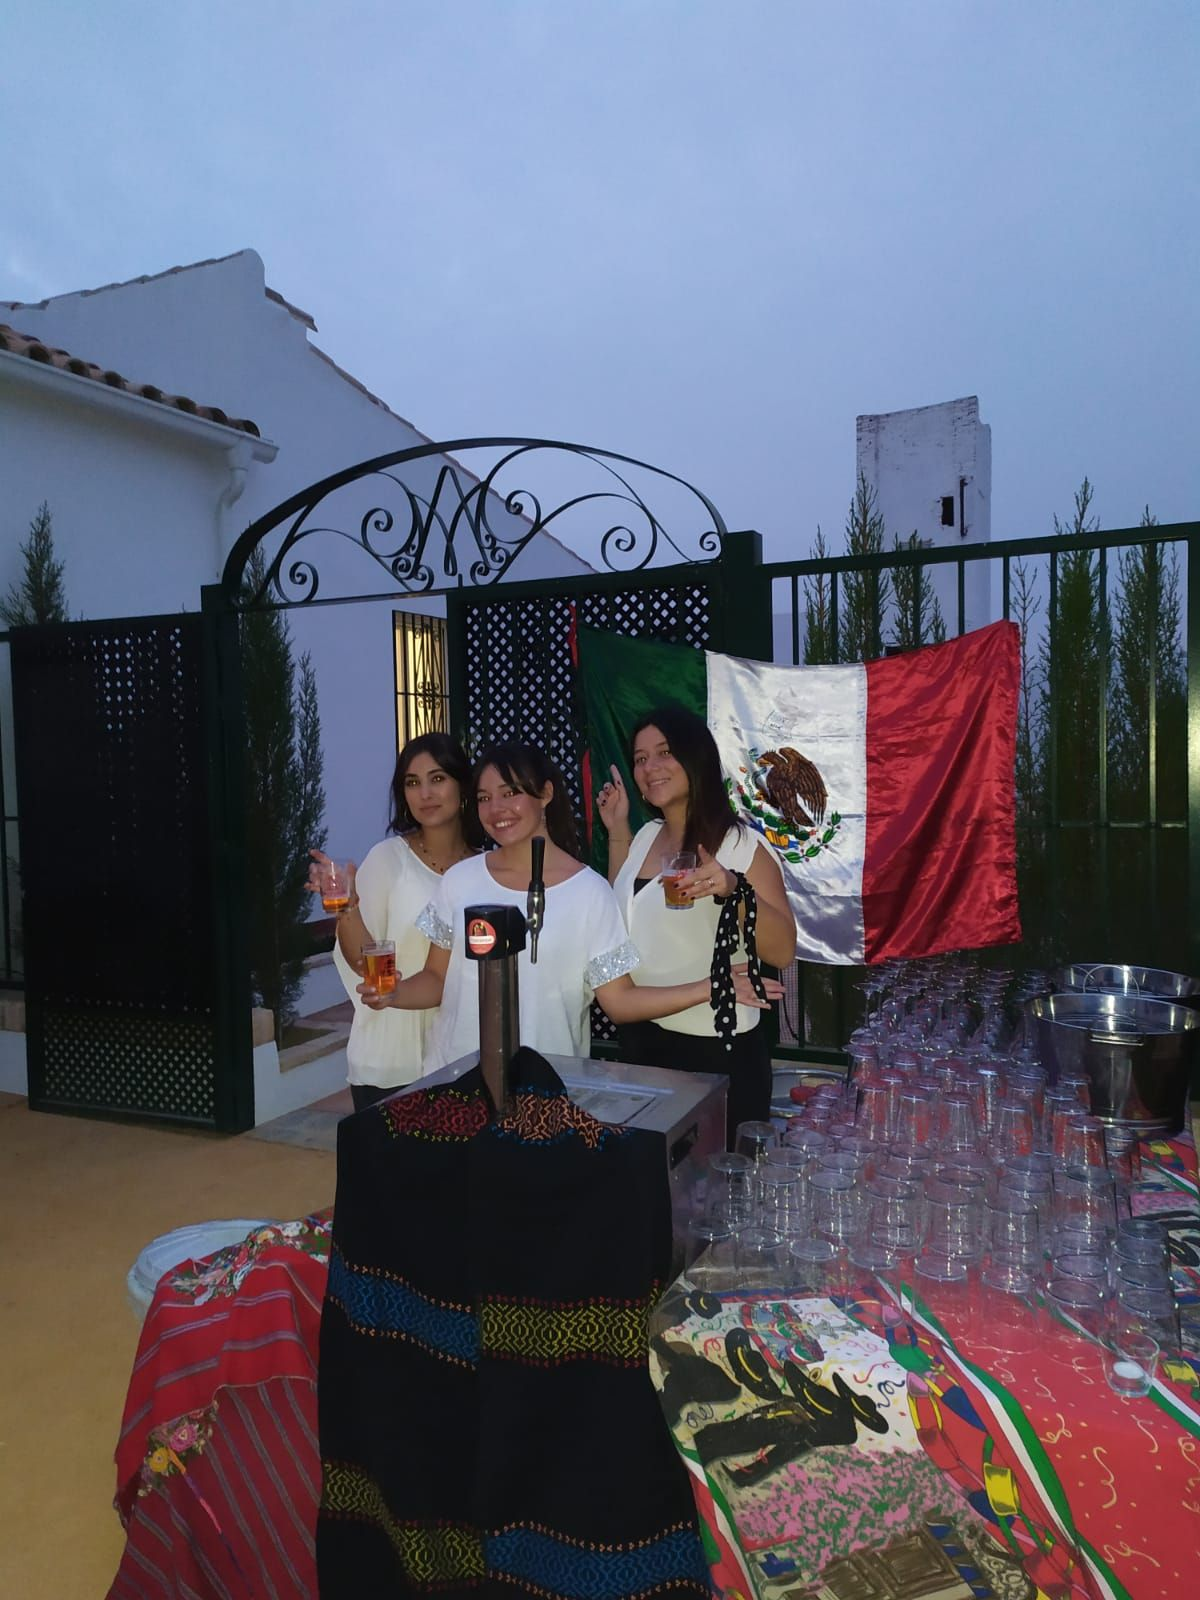 Foto 3 de Restaurante mexicano en  | Cantina La Catrina